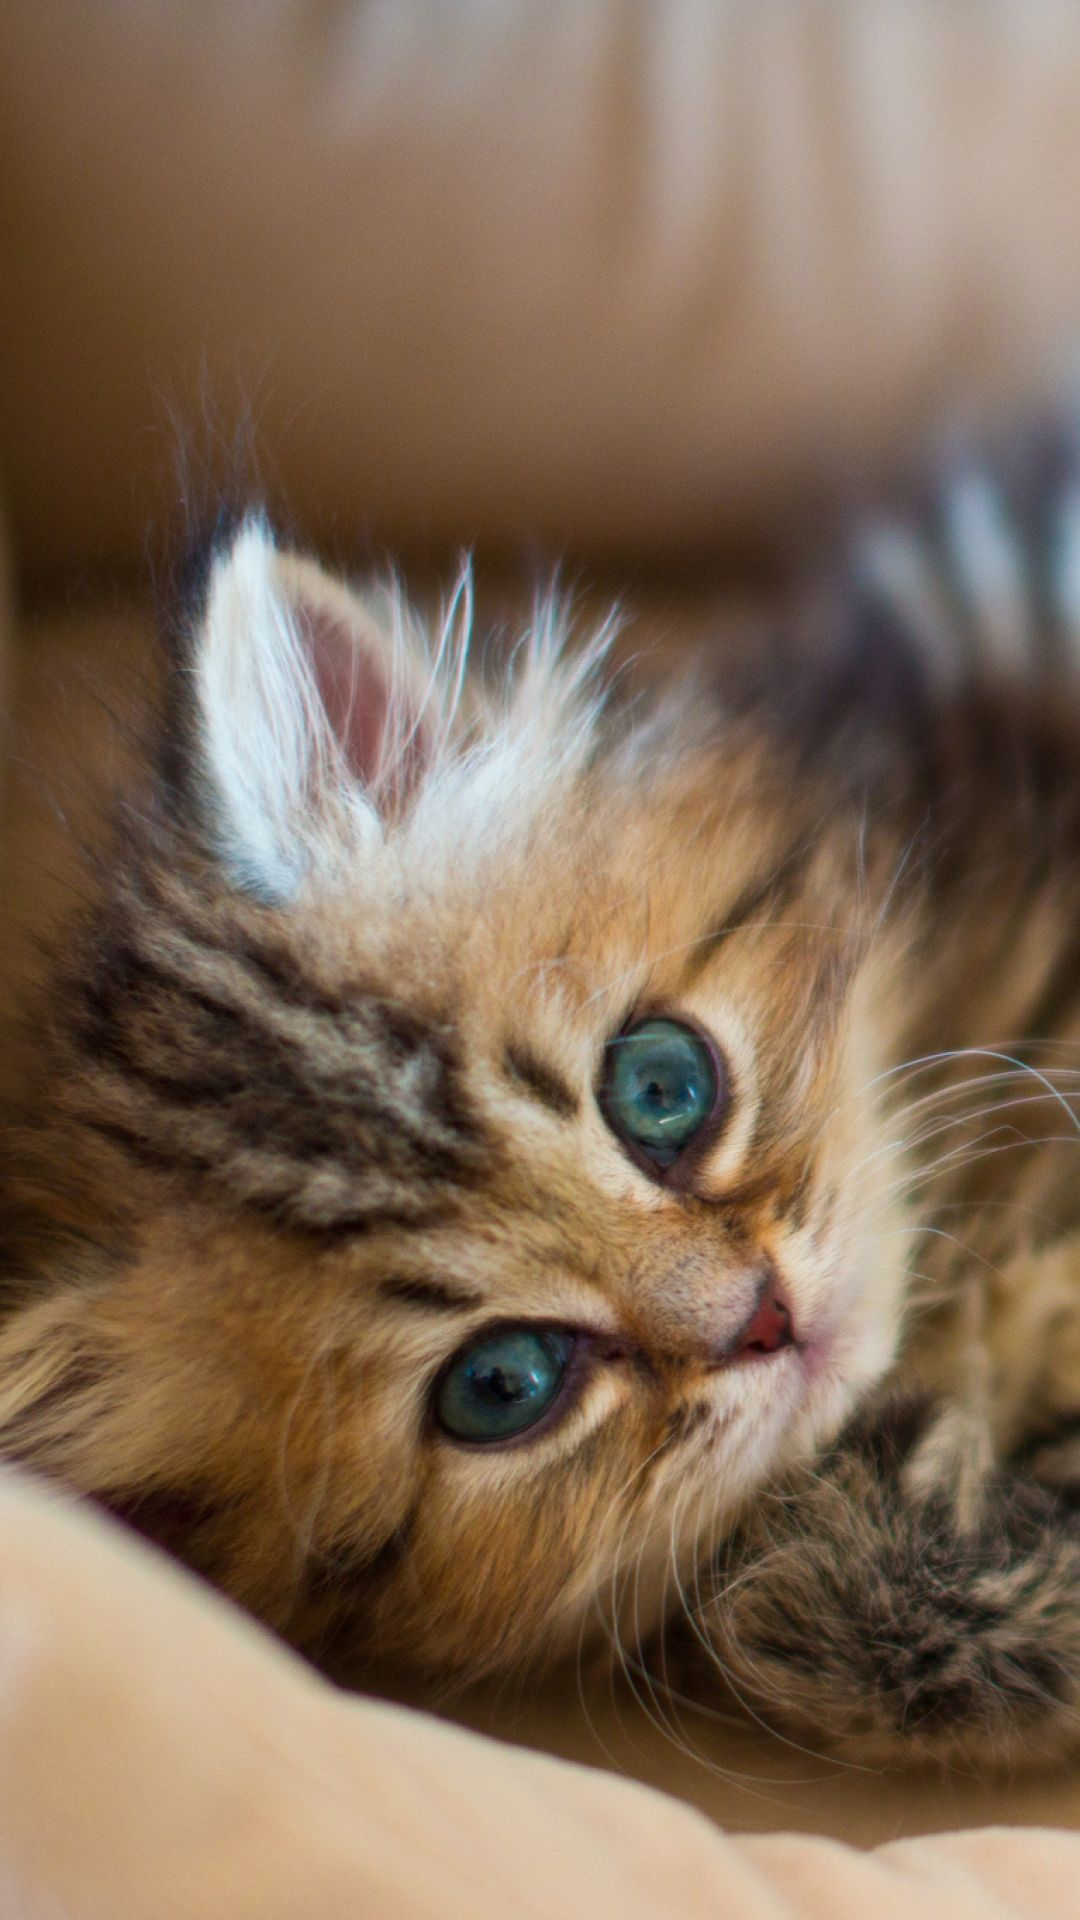 Kitty Fluffy Face Down Playful Kittens Kitten Images Pets